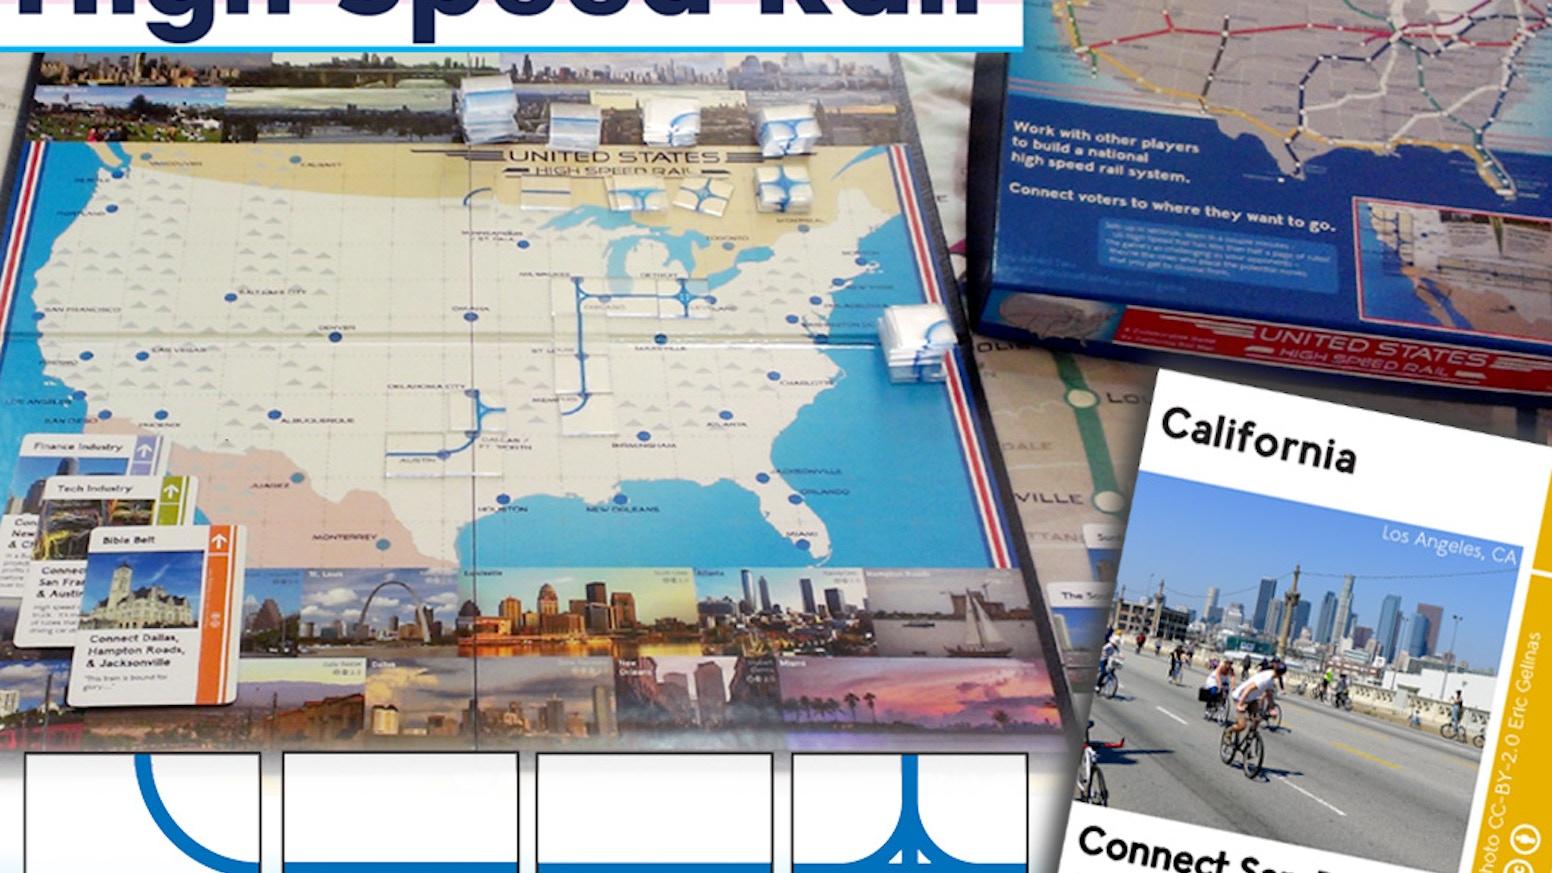 High Speed Rail Board Game by Alfred — Kickstarter